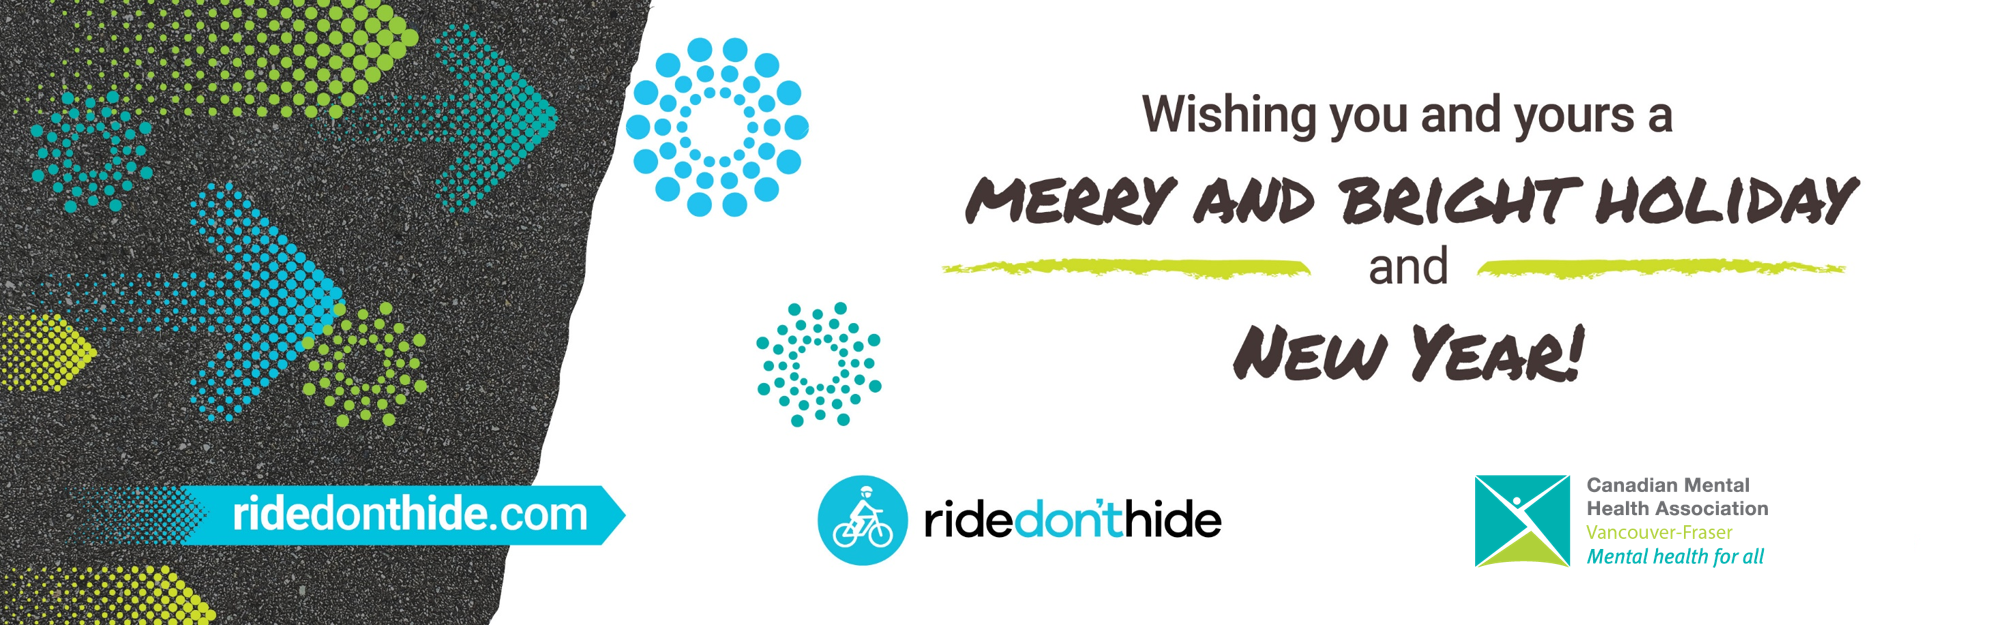 Ride Don't Hide 2020